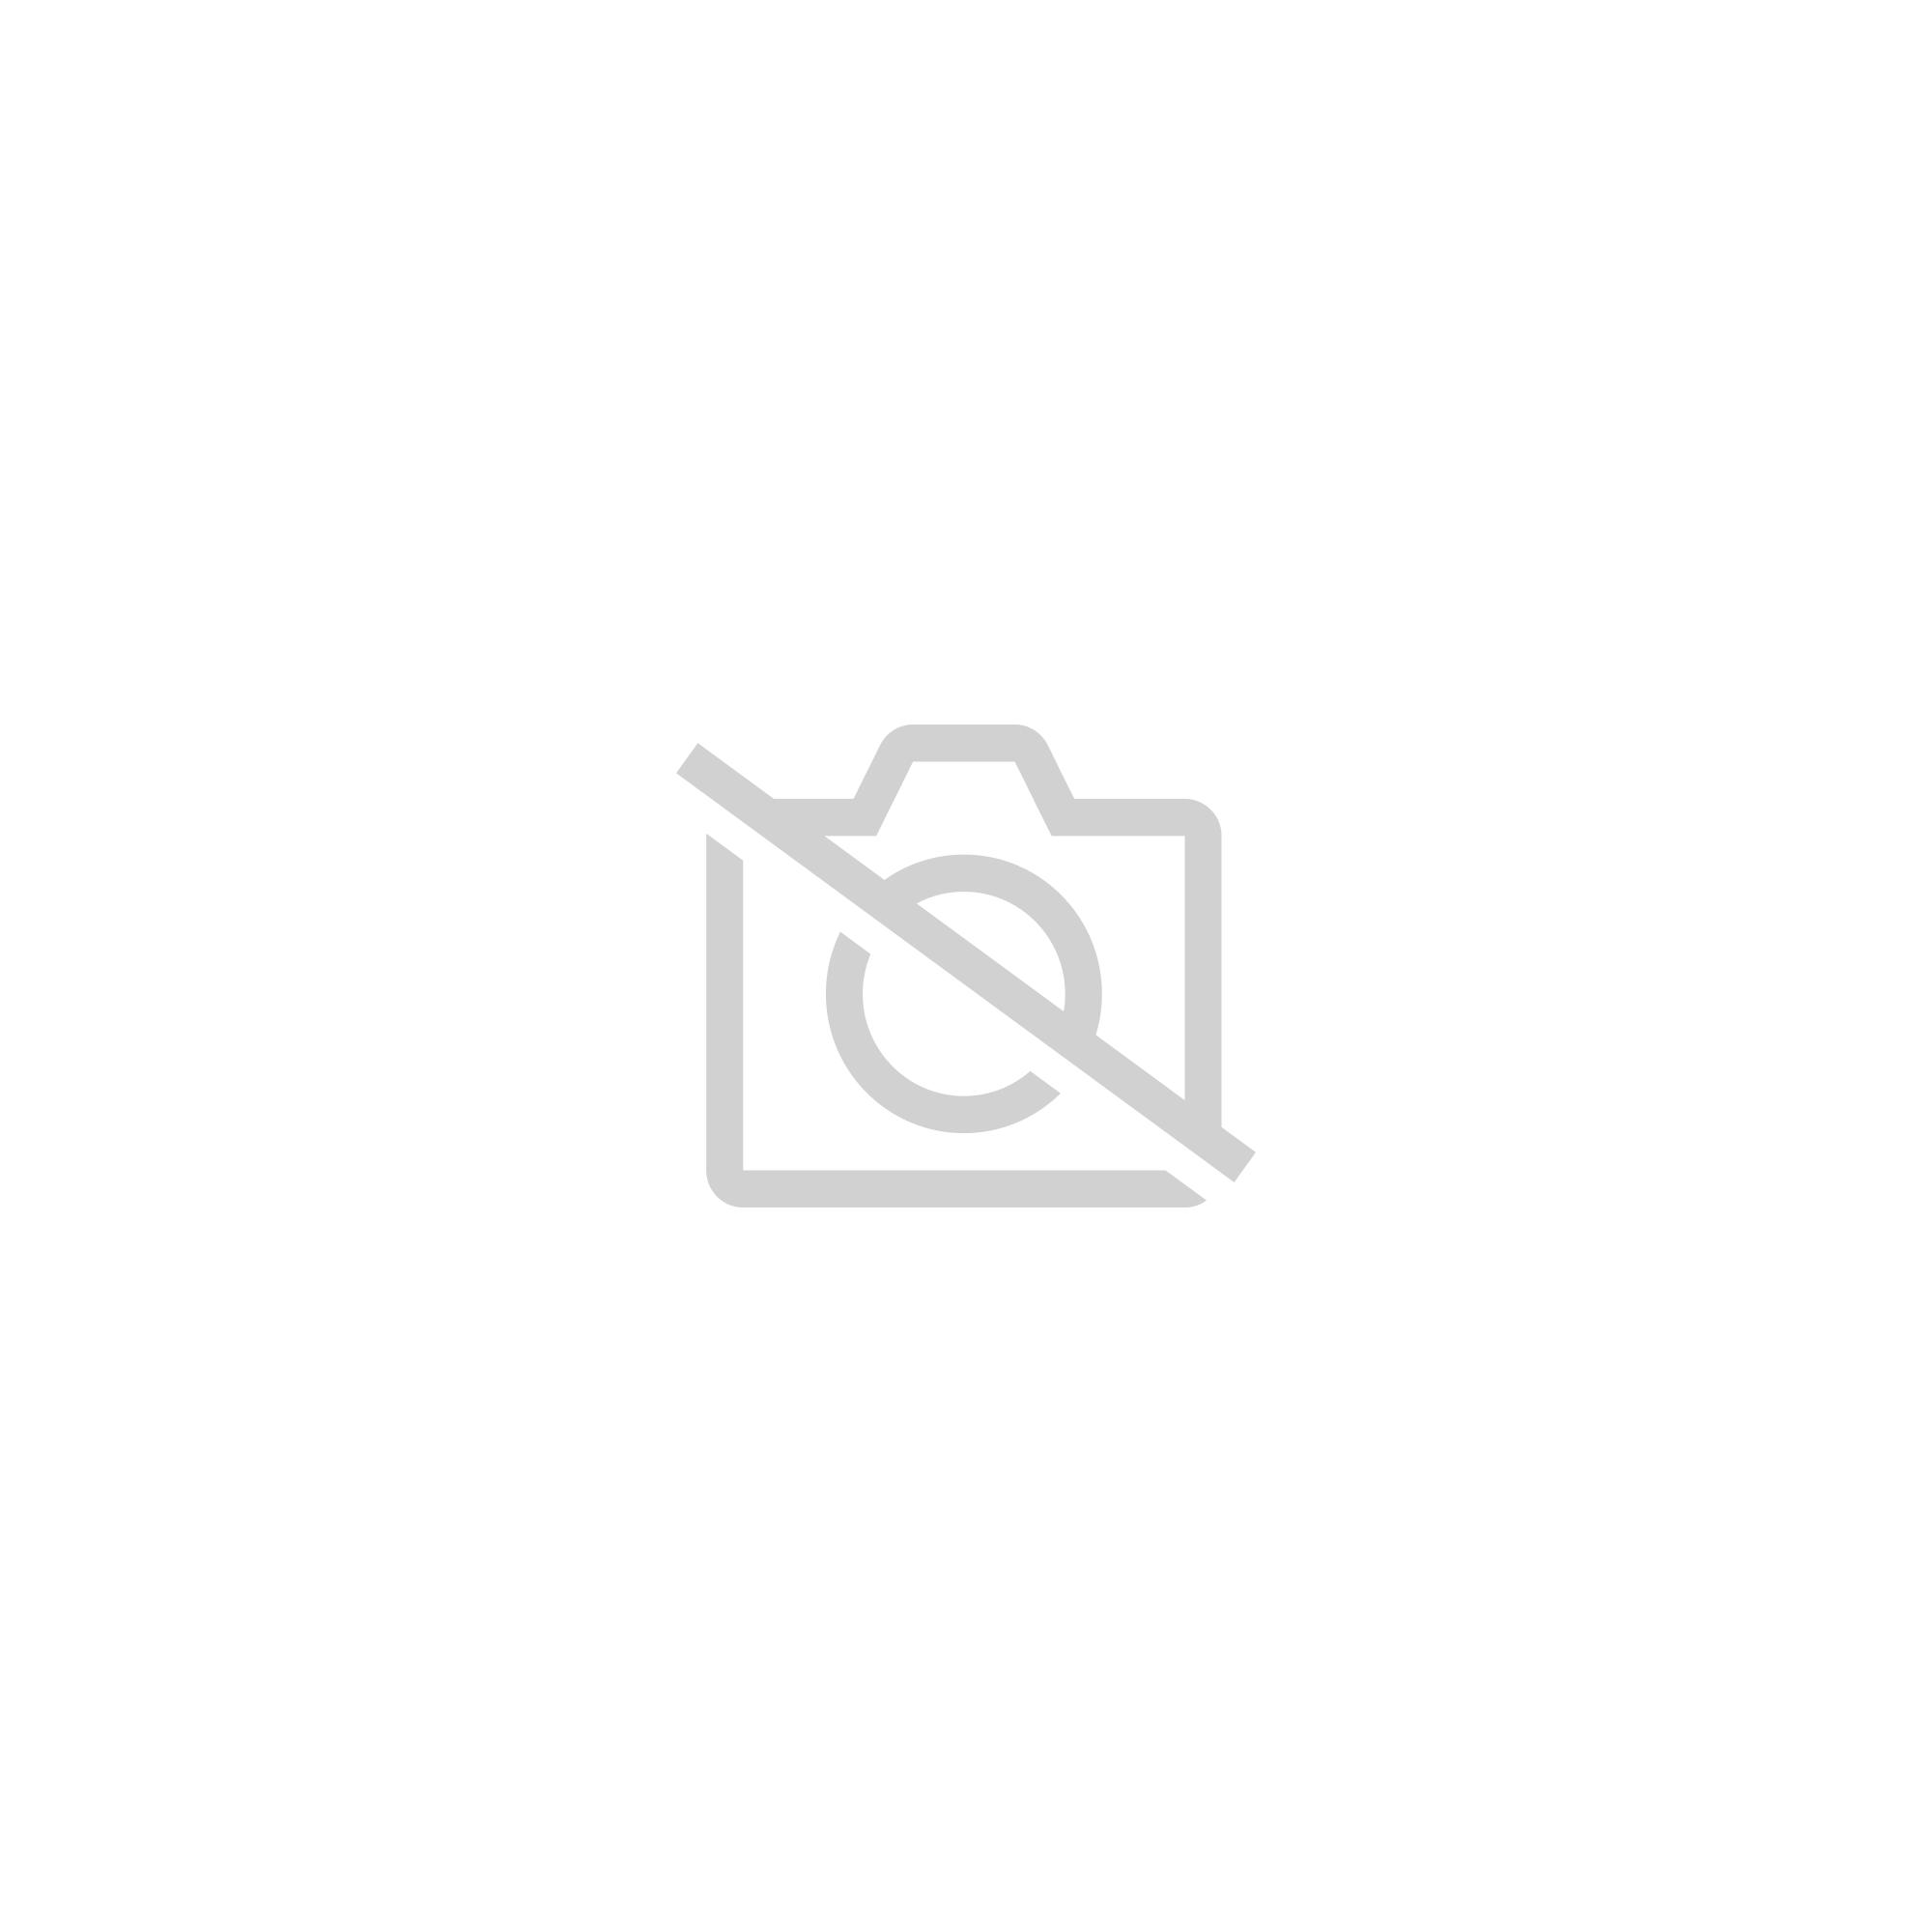 COCOTTE MIJOTEUSE FONTE OVALE TAUPE 35 CM 7.4L INVICTA